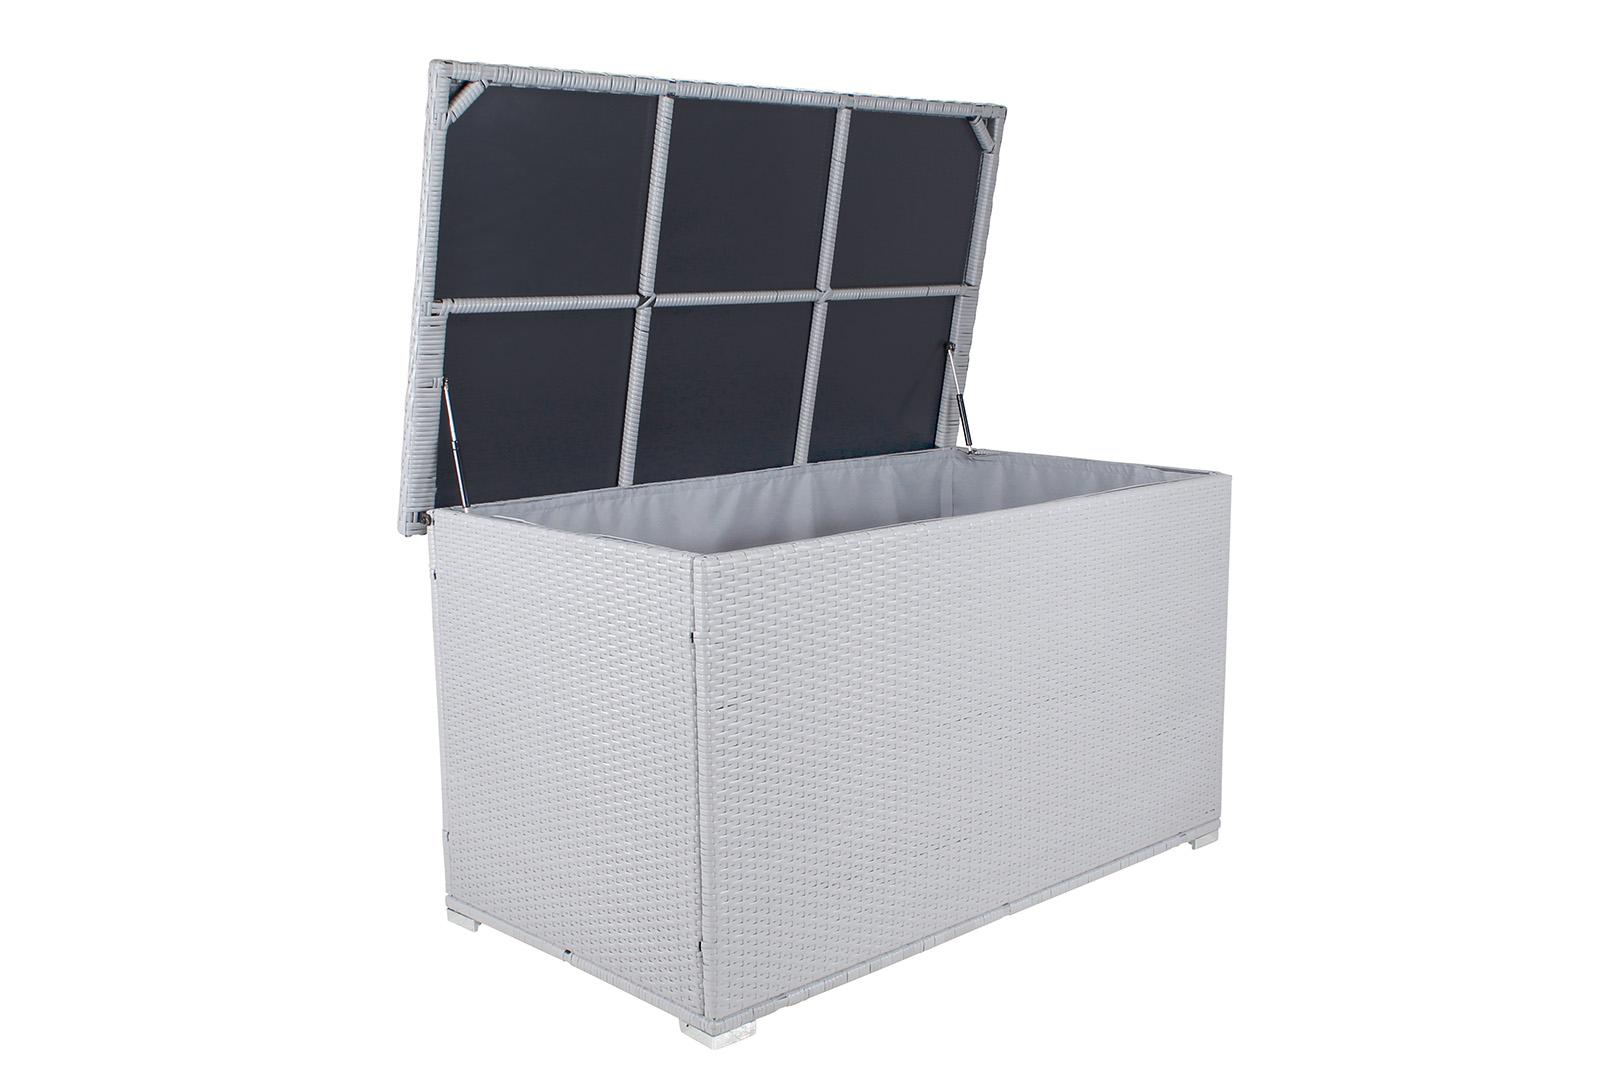 miweba xxl auflagenbox kissenbox 950l gartentruhe box polyrattan liege sitztruhe. Black Bedroom Furniture Sets. Home Design Ideas